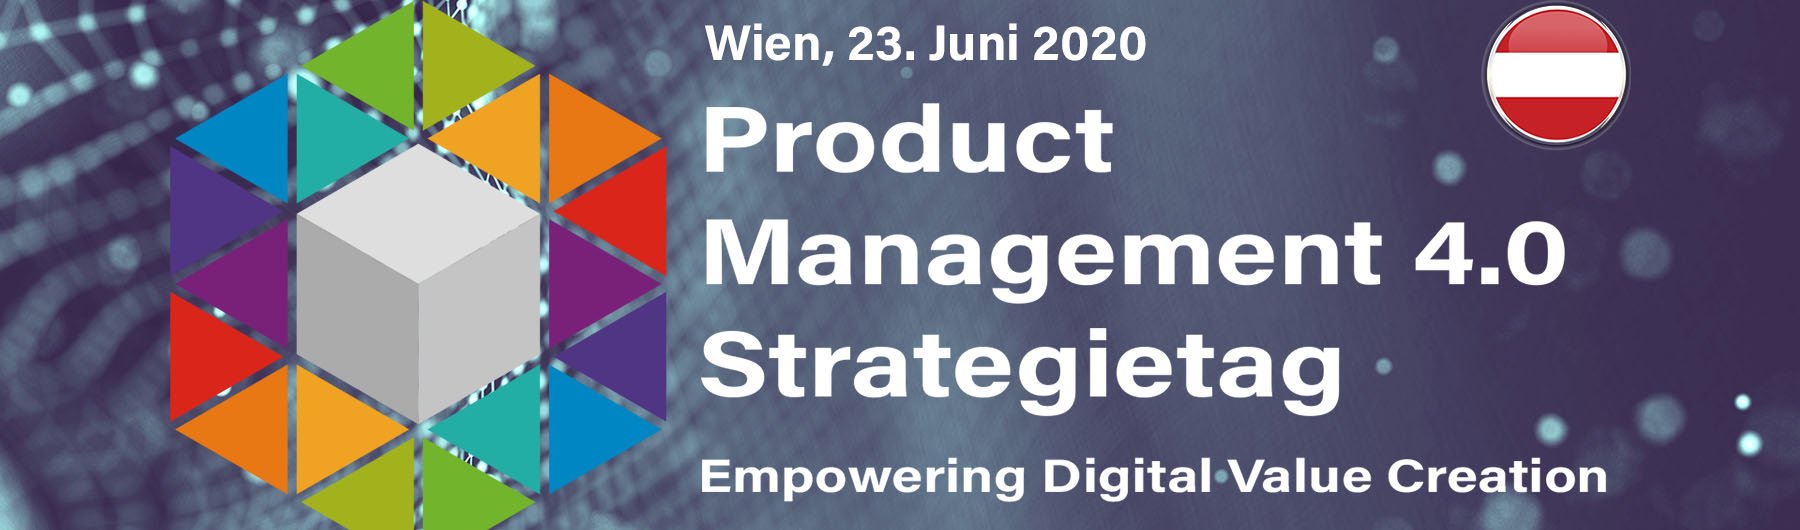 Product Management 4.0 Strategietag Wien 2020